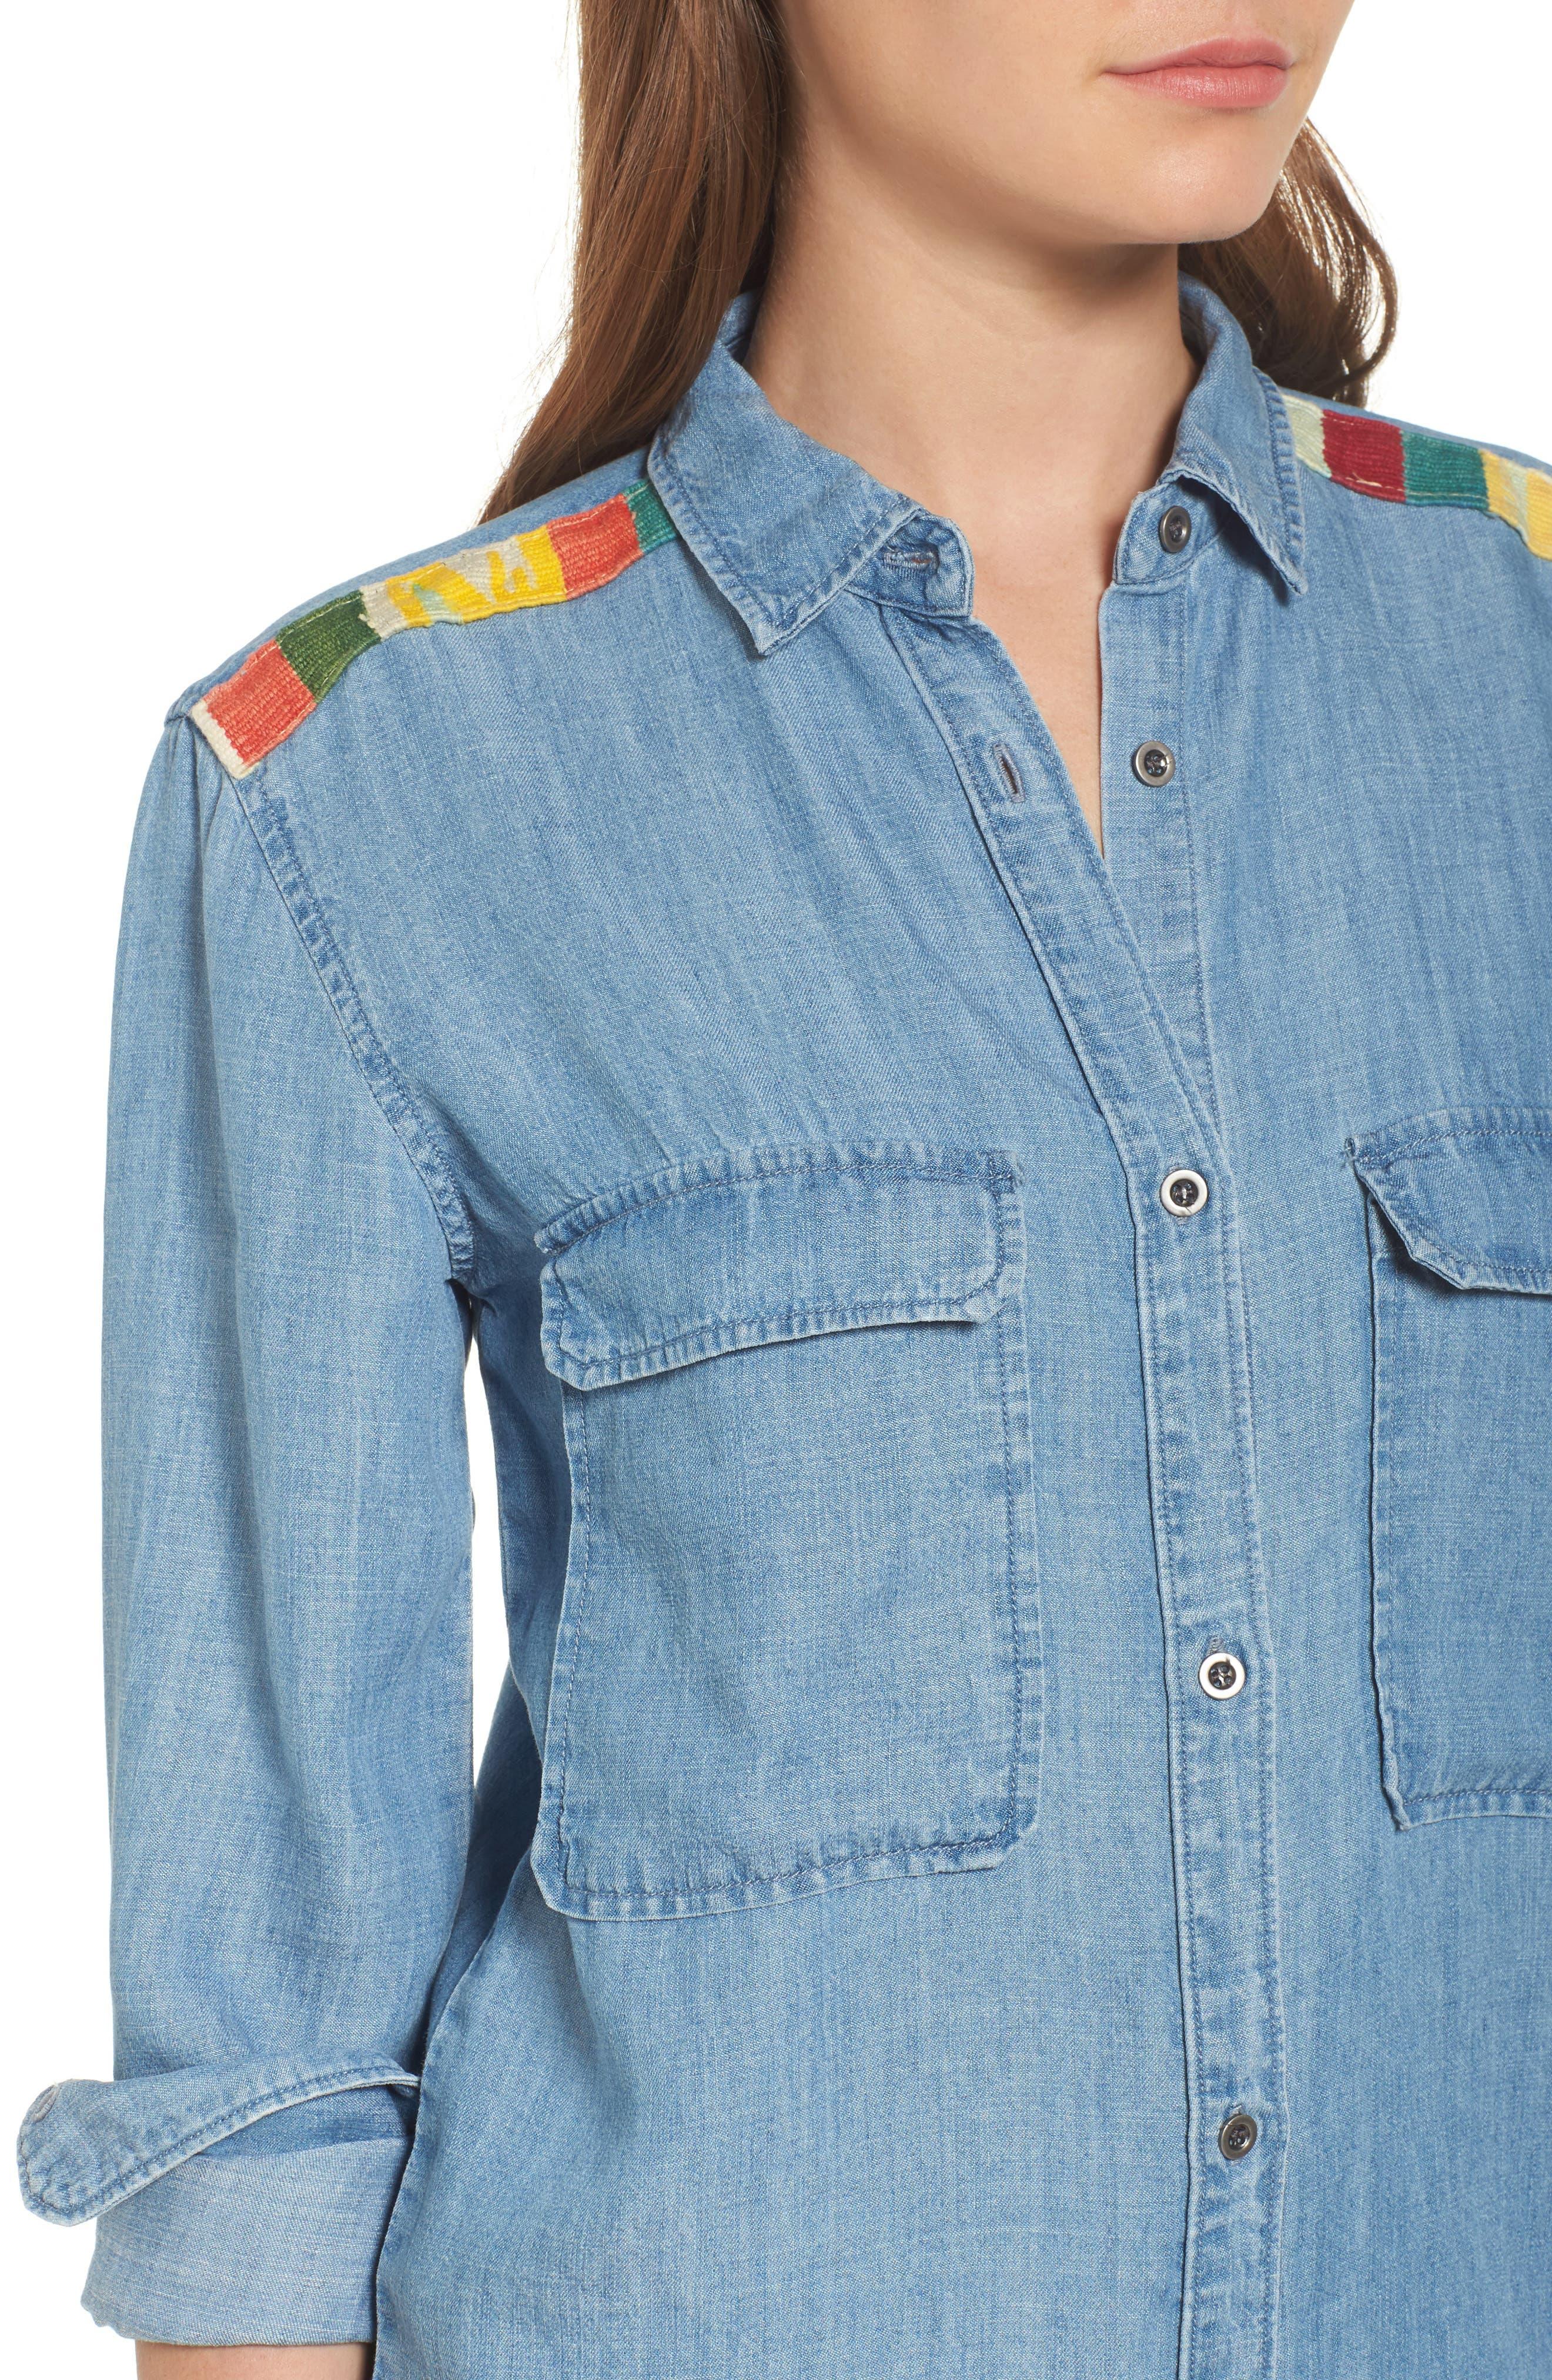 Jimi Chambray Shirt,                             Alternate thumbnail 4, color,                             493